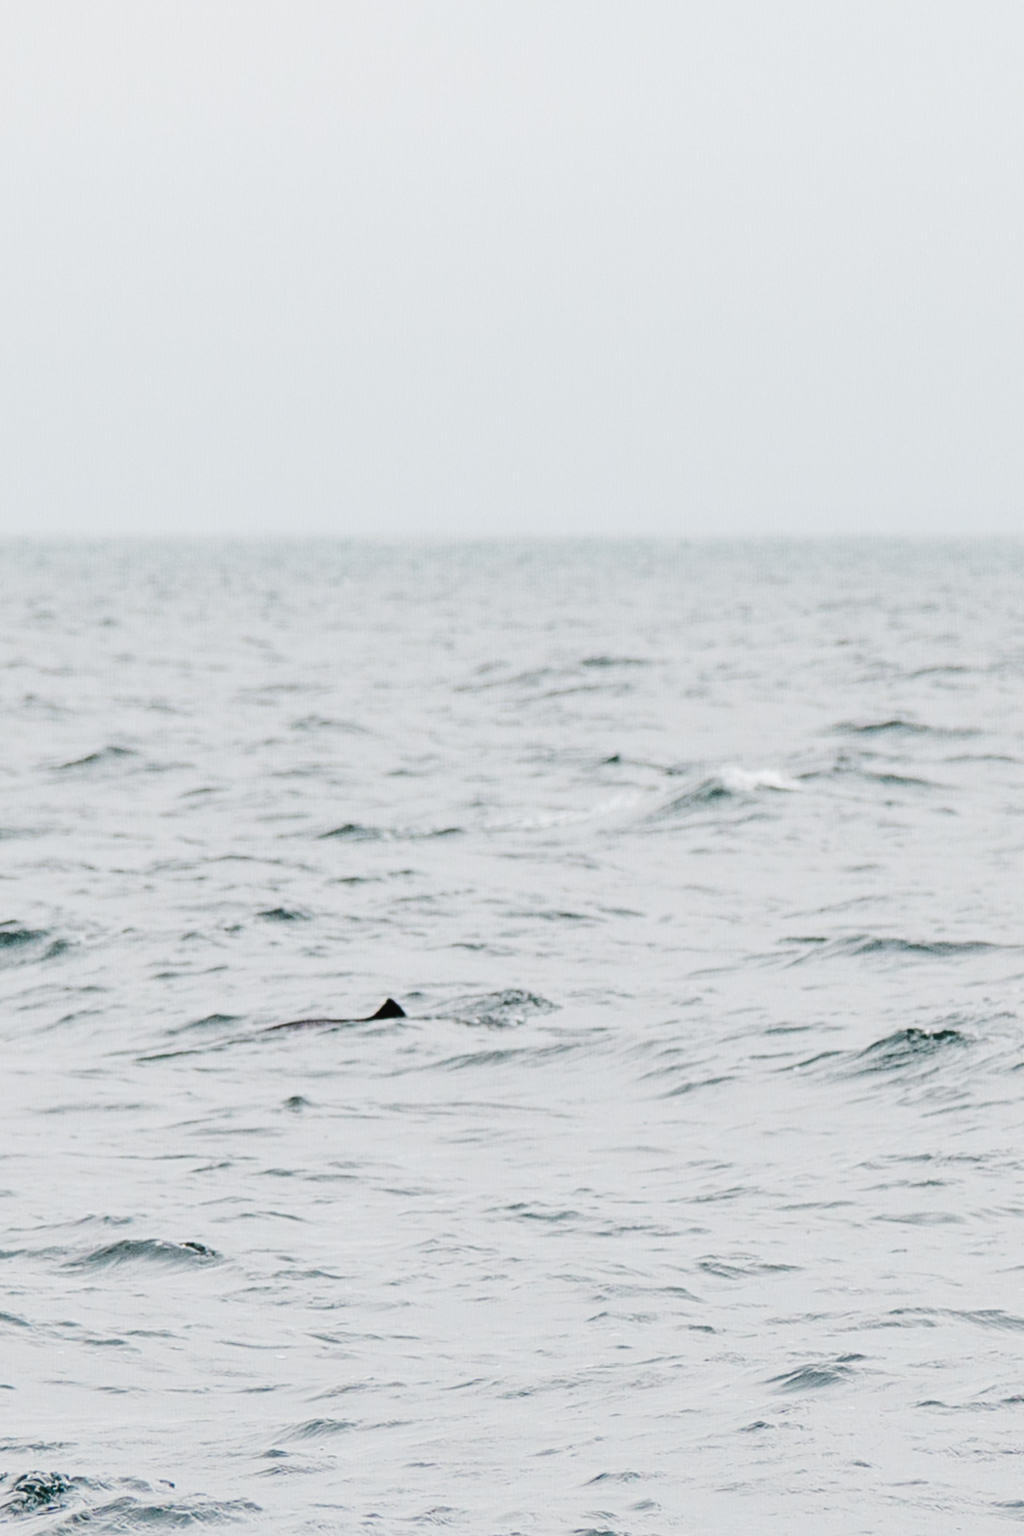 Kullaberg National Park, Whale Safari, Skåne, Sweden